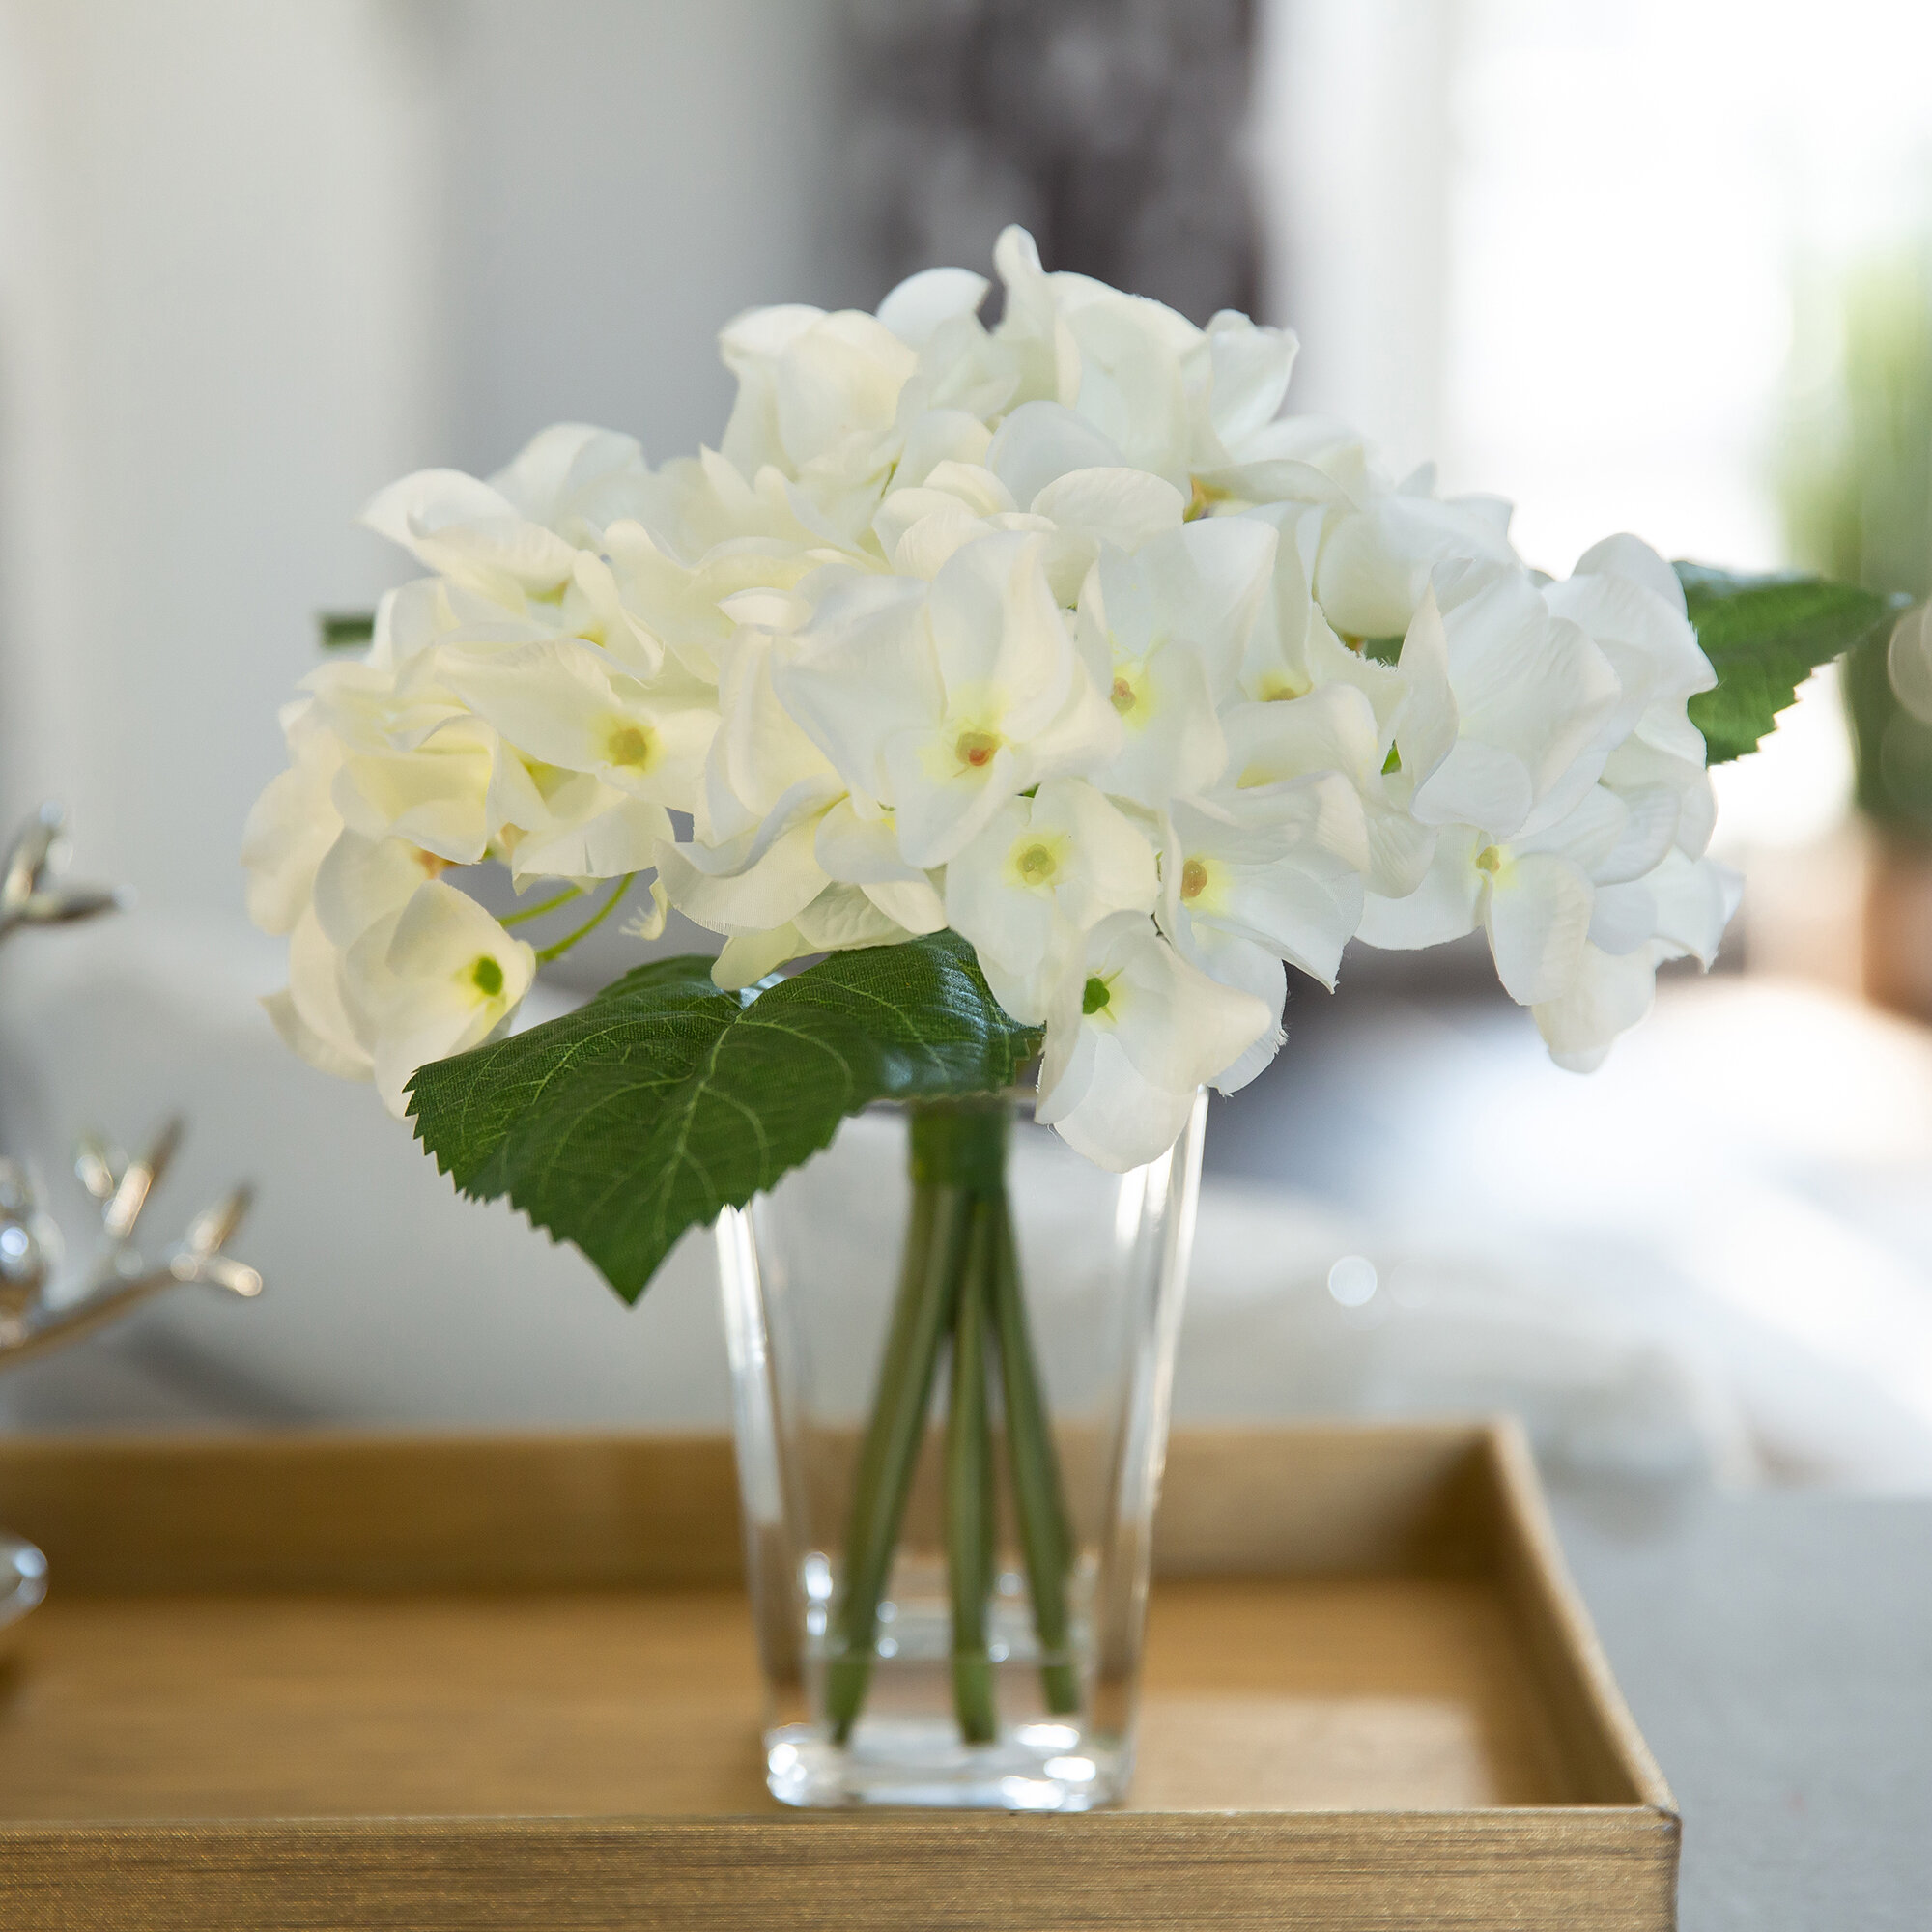 Living Vases Hand Tie Boxes 5 x Lilac Florist Aqua Boxes